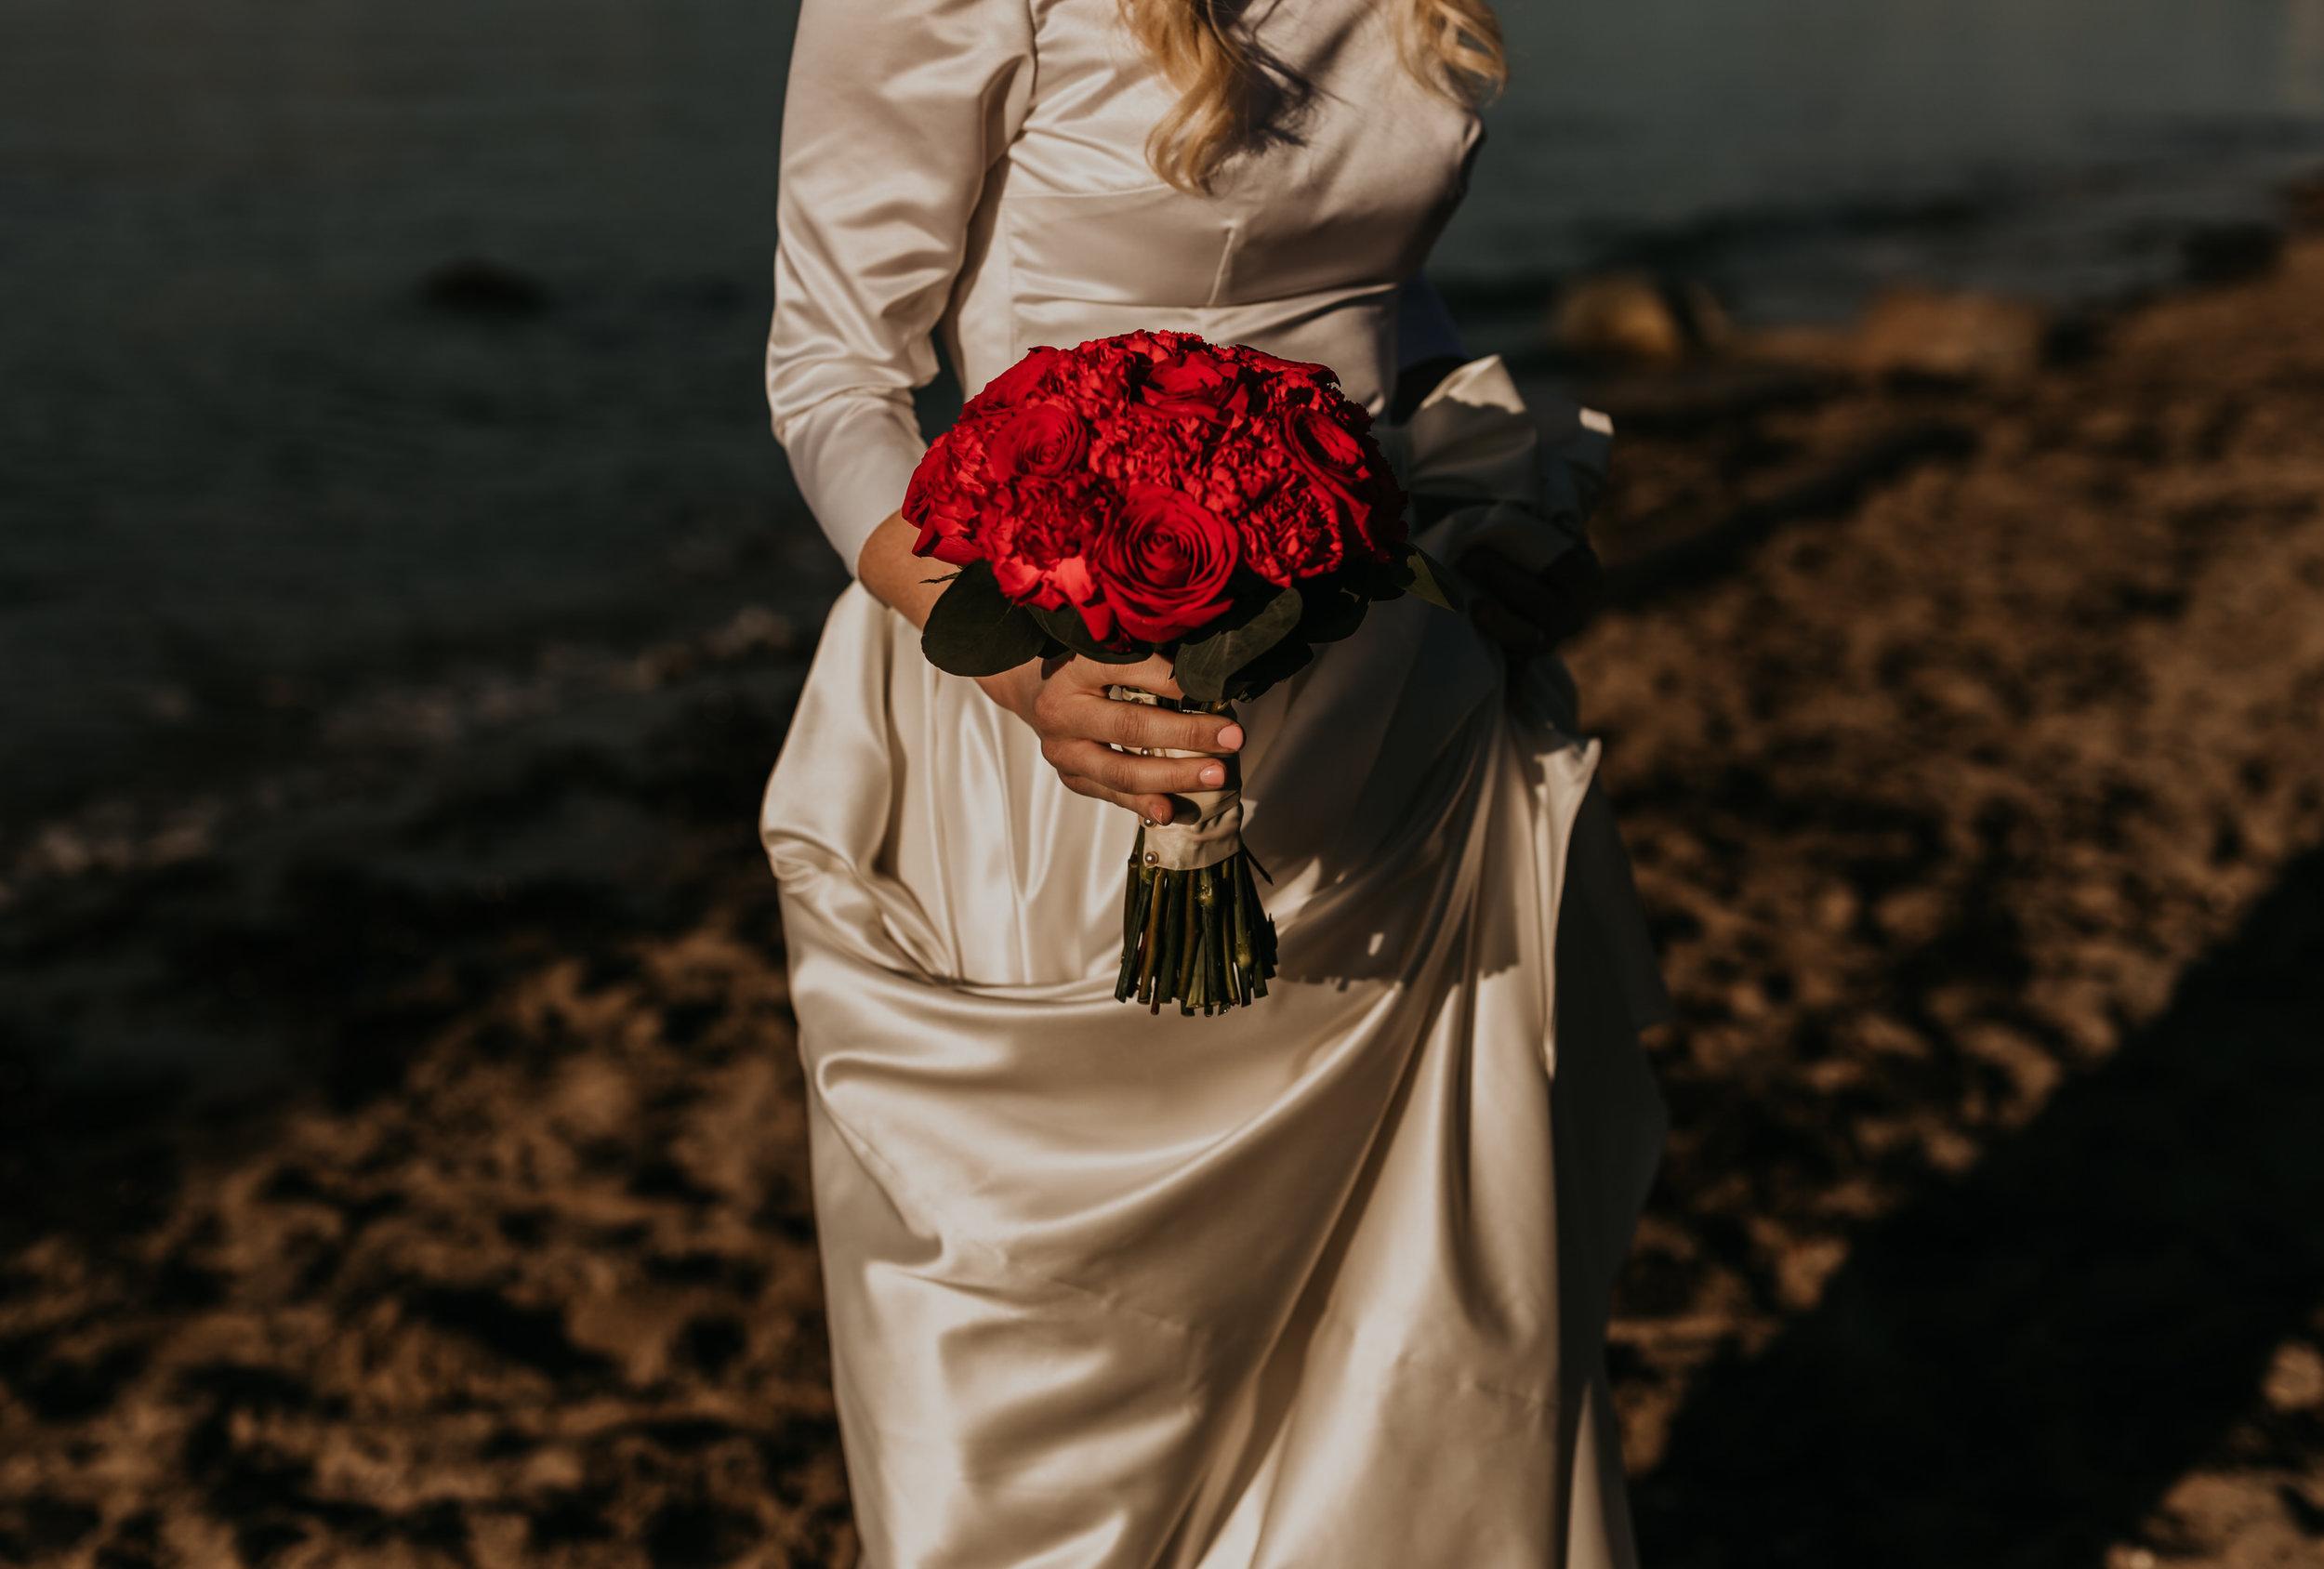 Vancouver Wedding Photos - Vegan Wedding Photographer - New Years Eve Wedding Photos - Vancouver Wedding Photographer - Vancouver Wedding Videographer - 606.JPG